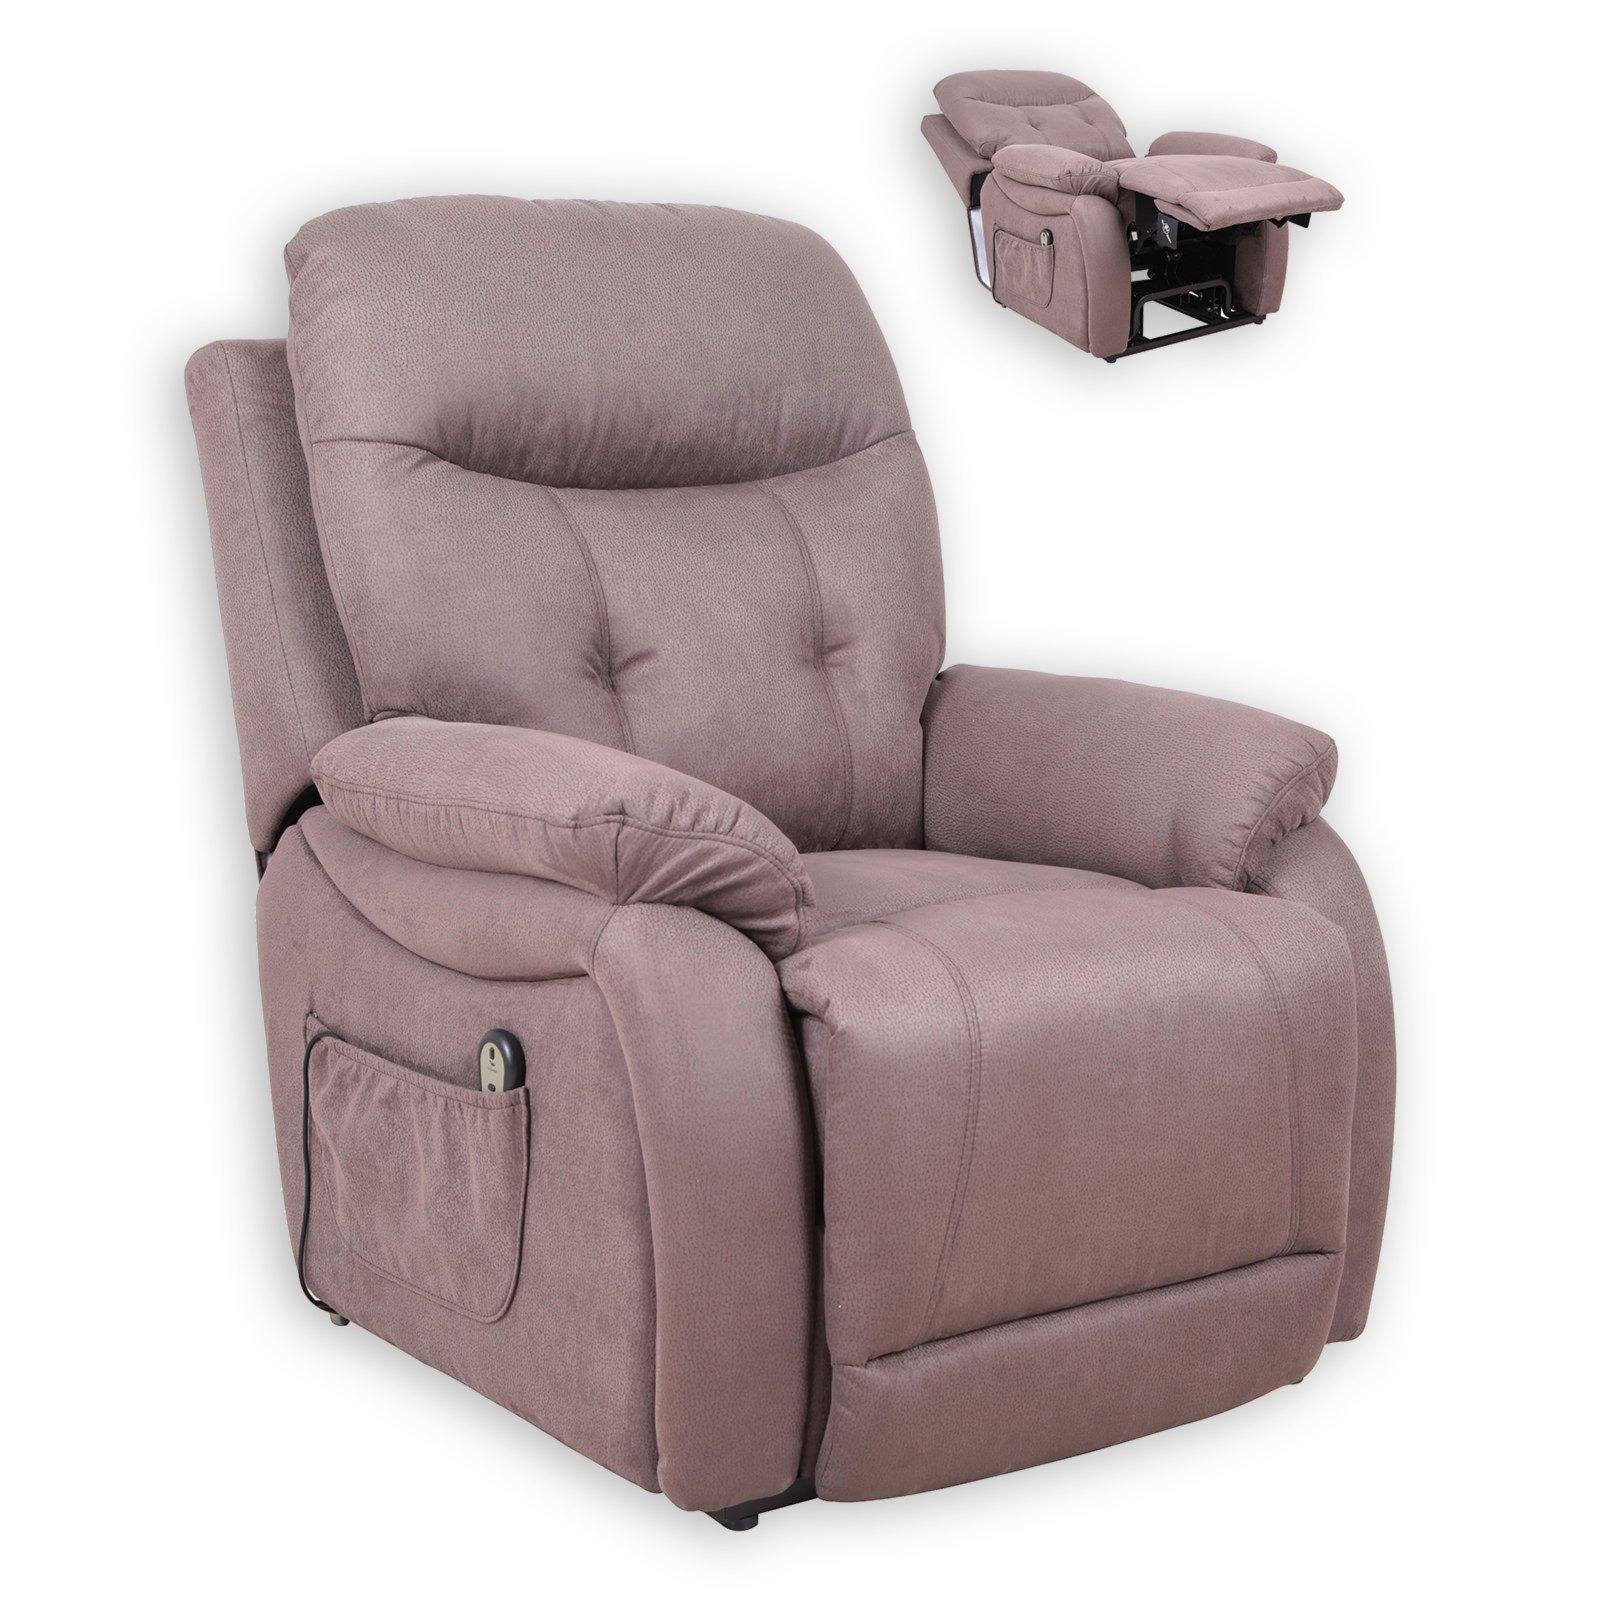 tv sessel braun mit aufstehhilfe fernseh relaxsessel sessel hocker m bel roller. Black Bedroom Furniture Sets. Home Design Ideas